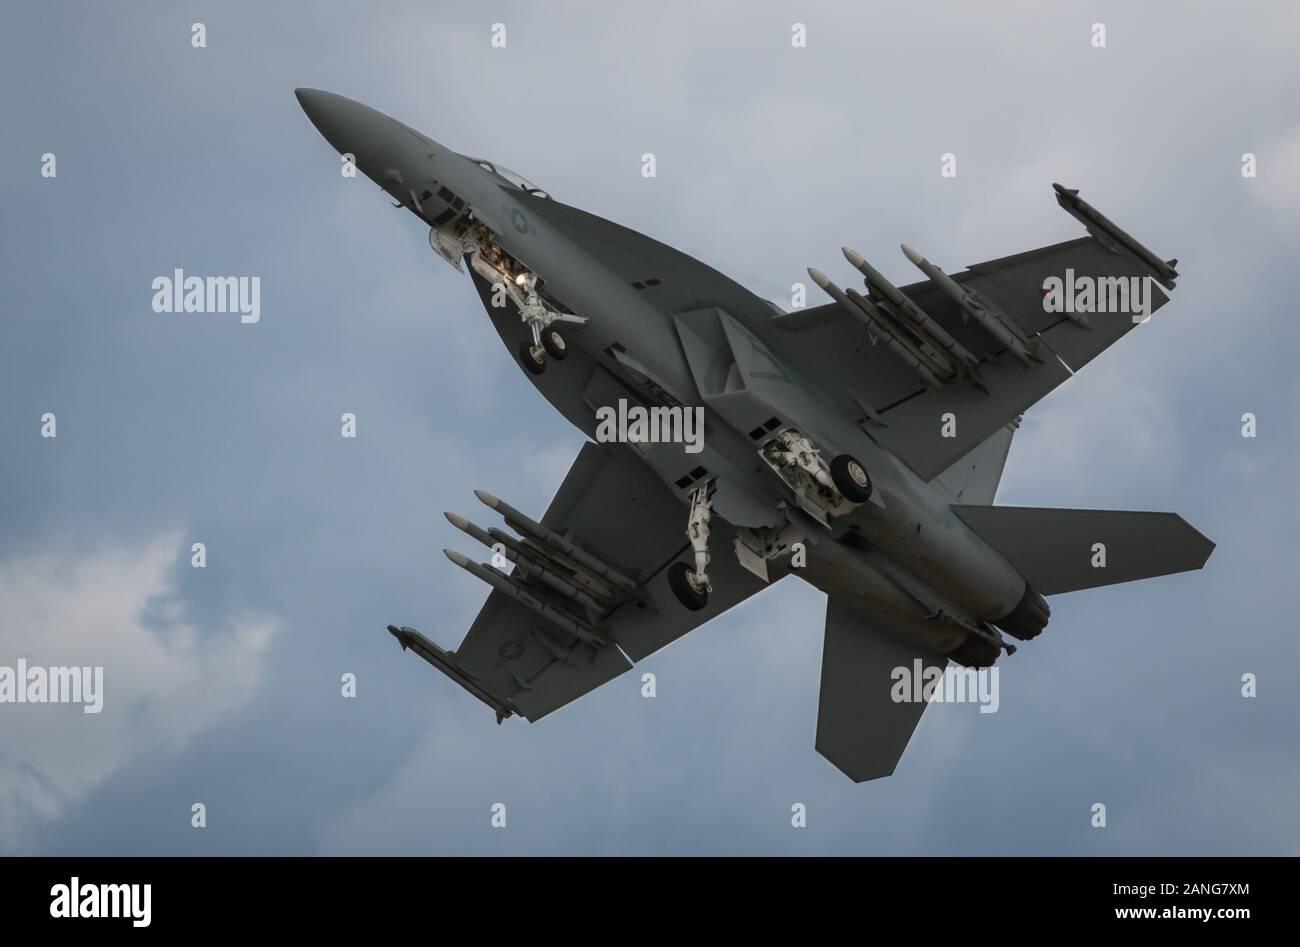 F18 Hornet Fighter Jet Stock Photo Alamy